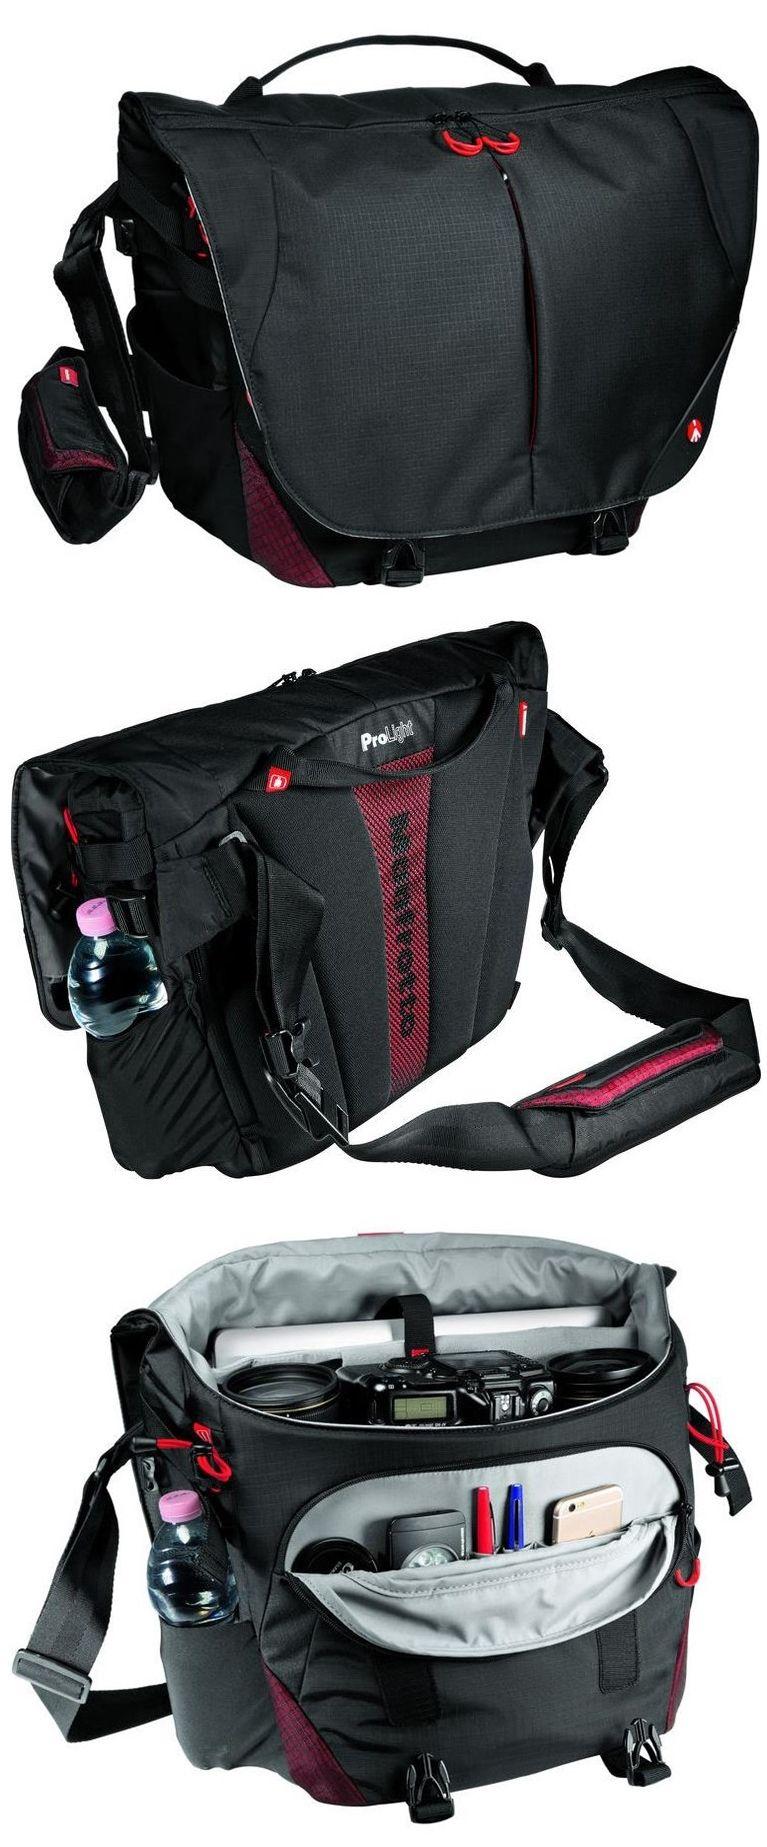 Black Manfrotto Bumblebee M-30 Pro Light Messenger Bag for DSLR Camera